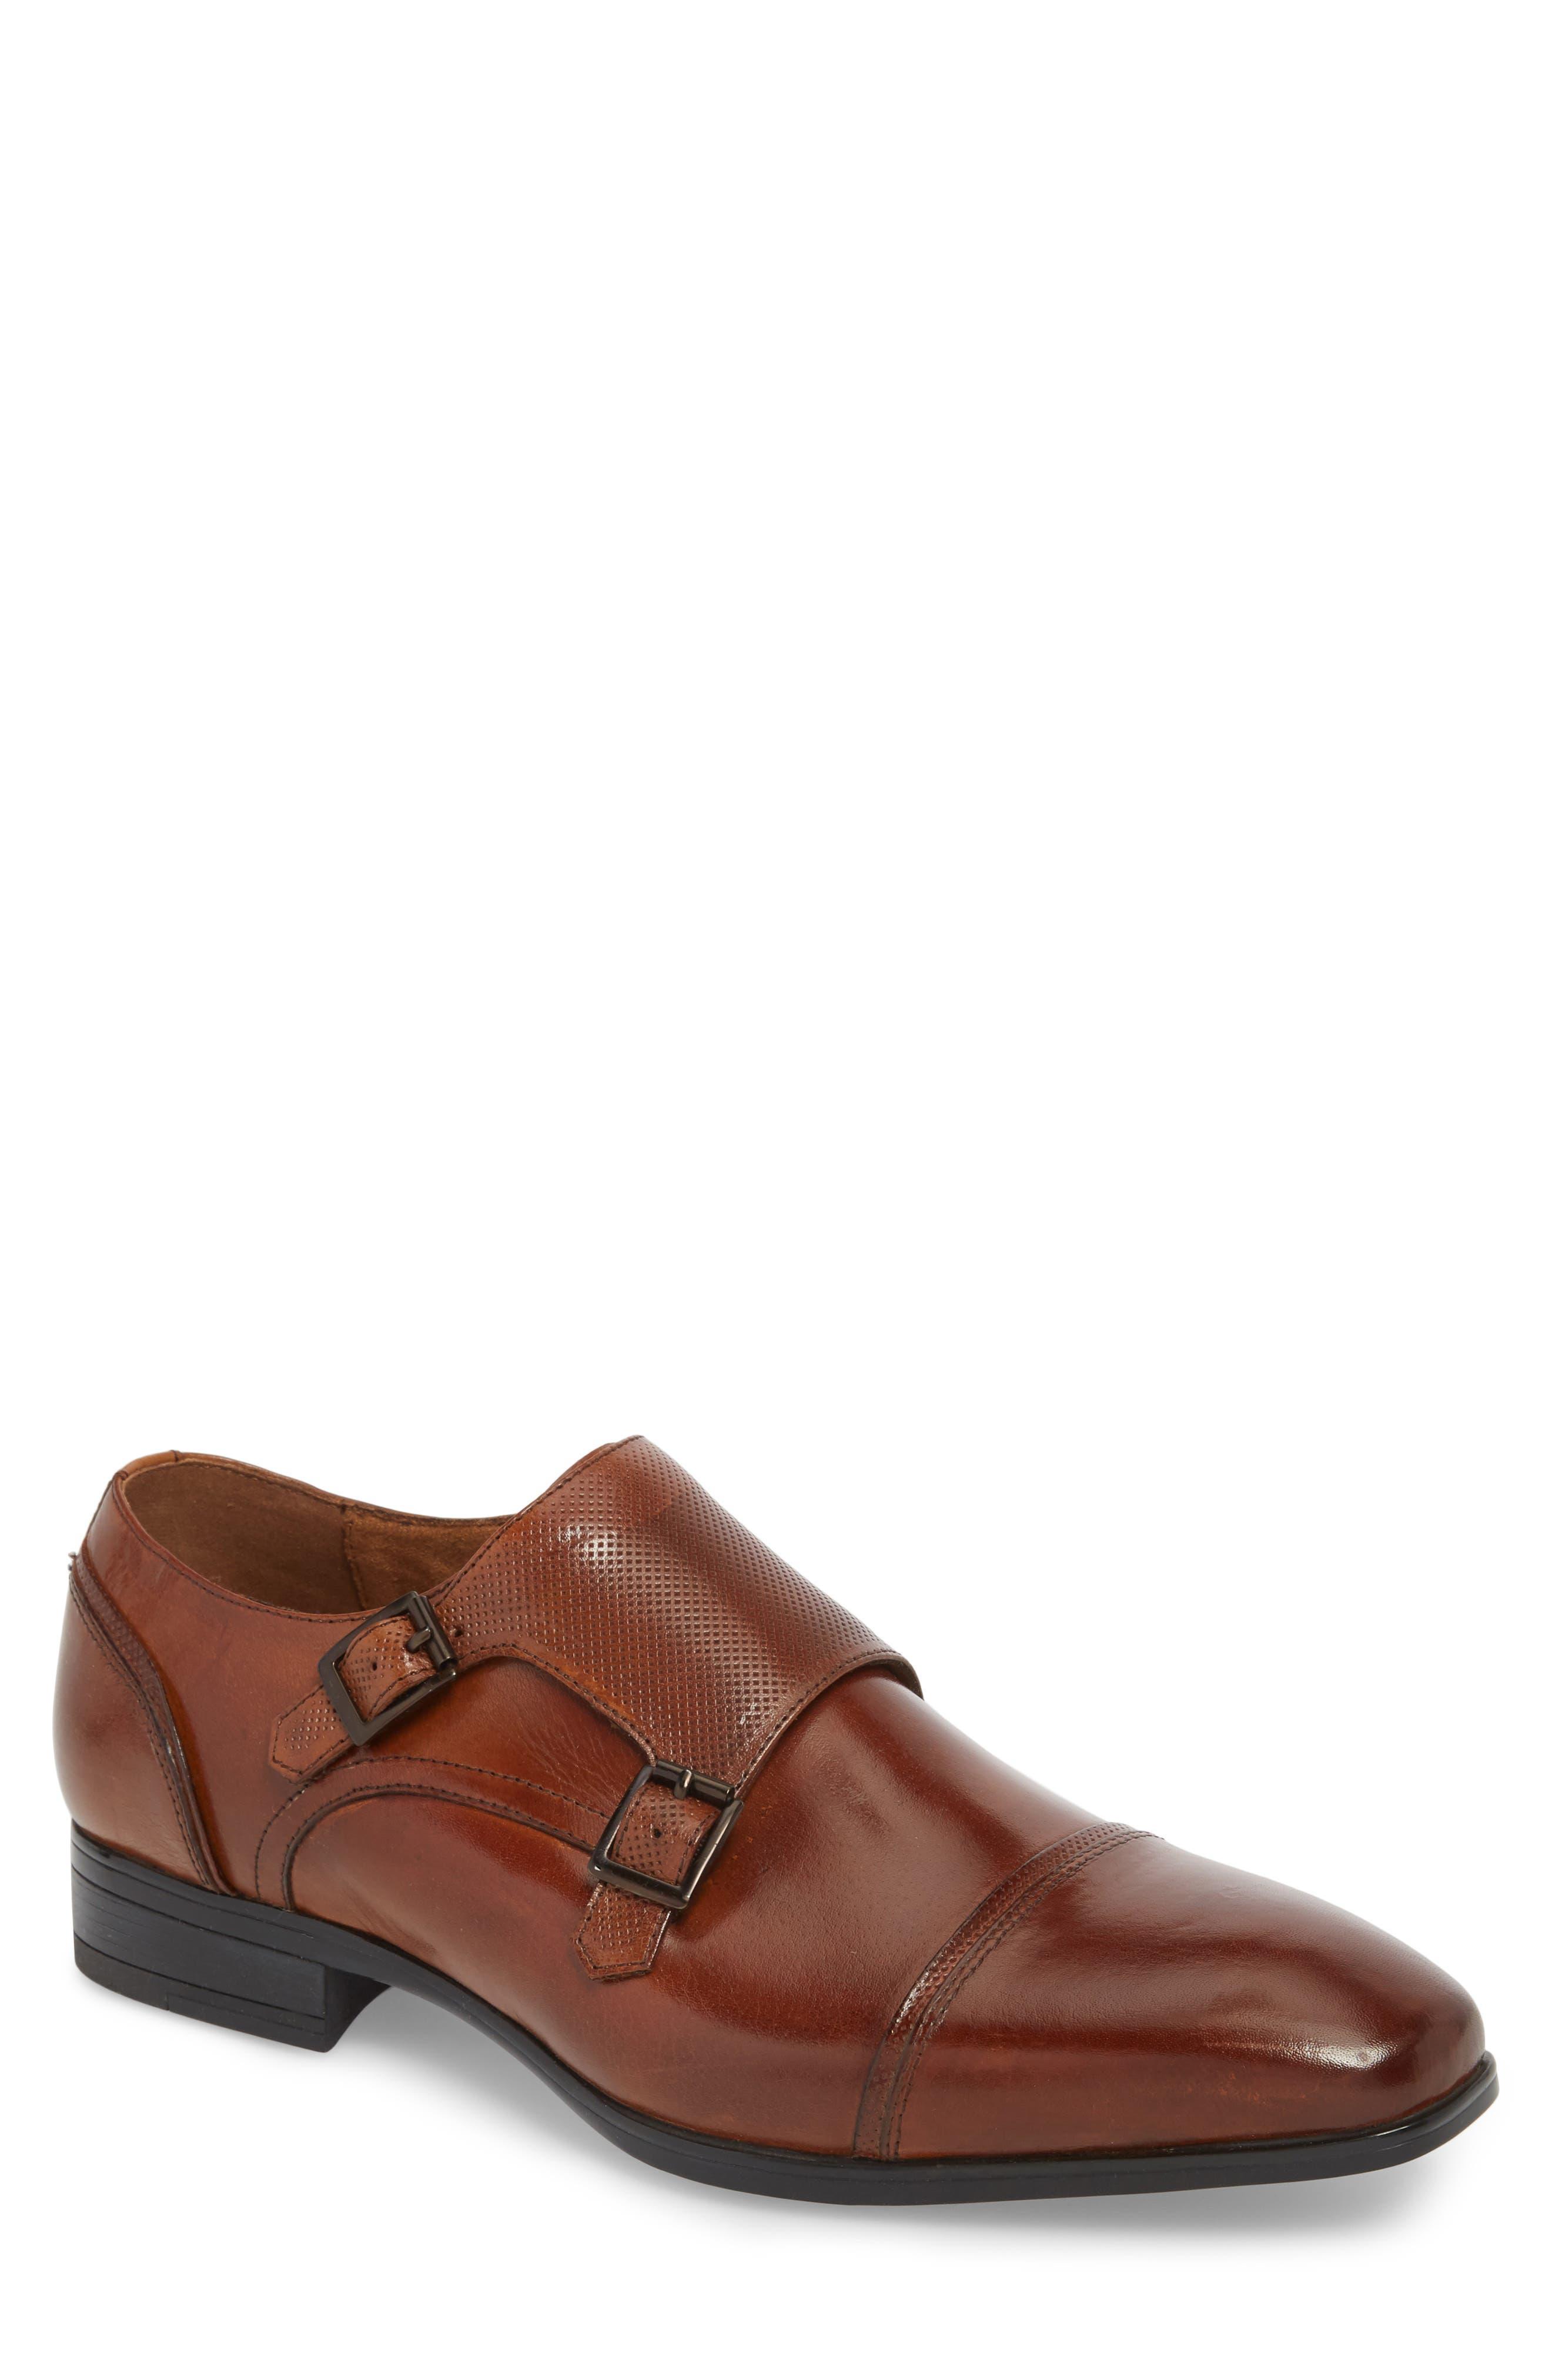 Kenneth Cole New York Oliver Cap Toe Monk Shoe (Men)